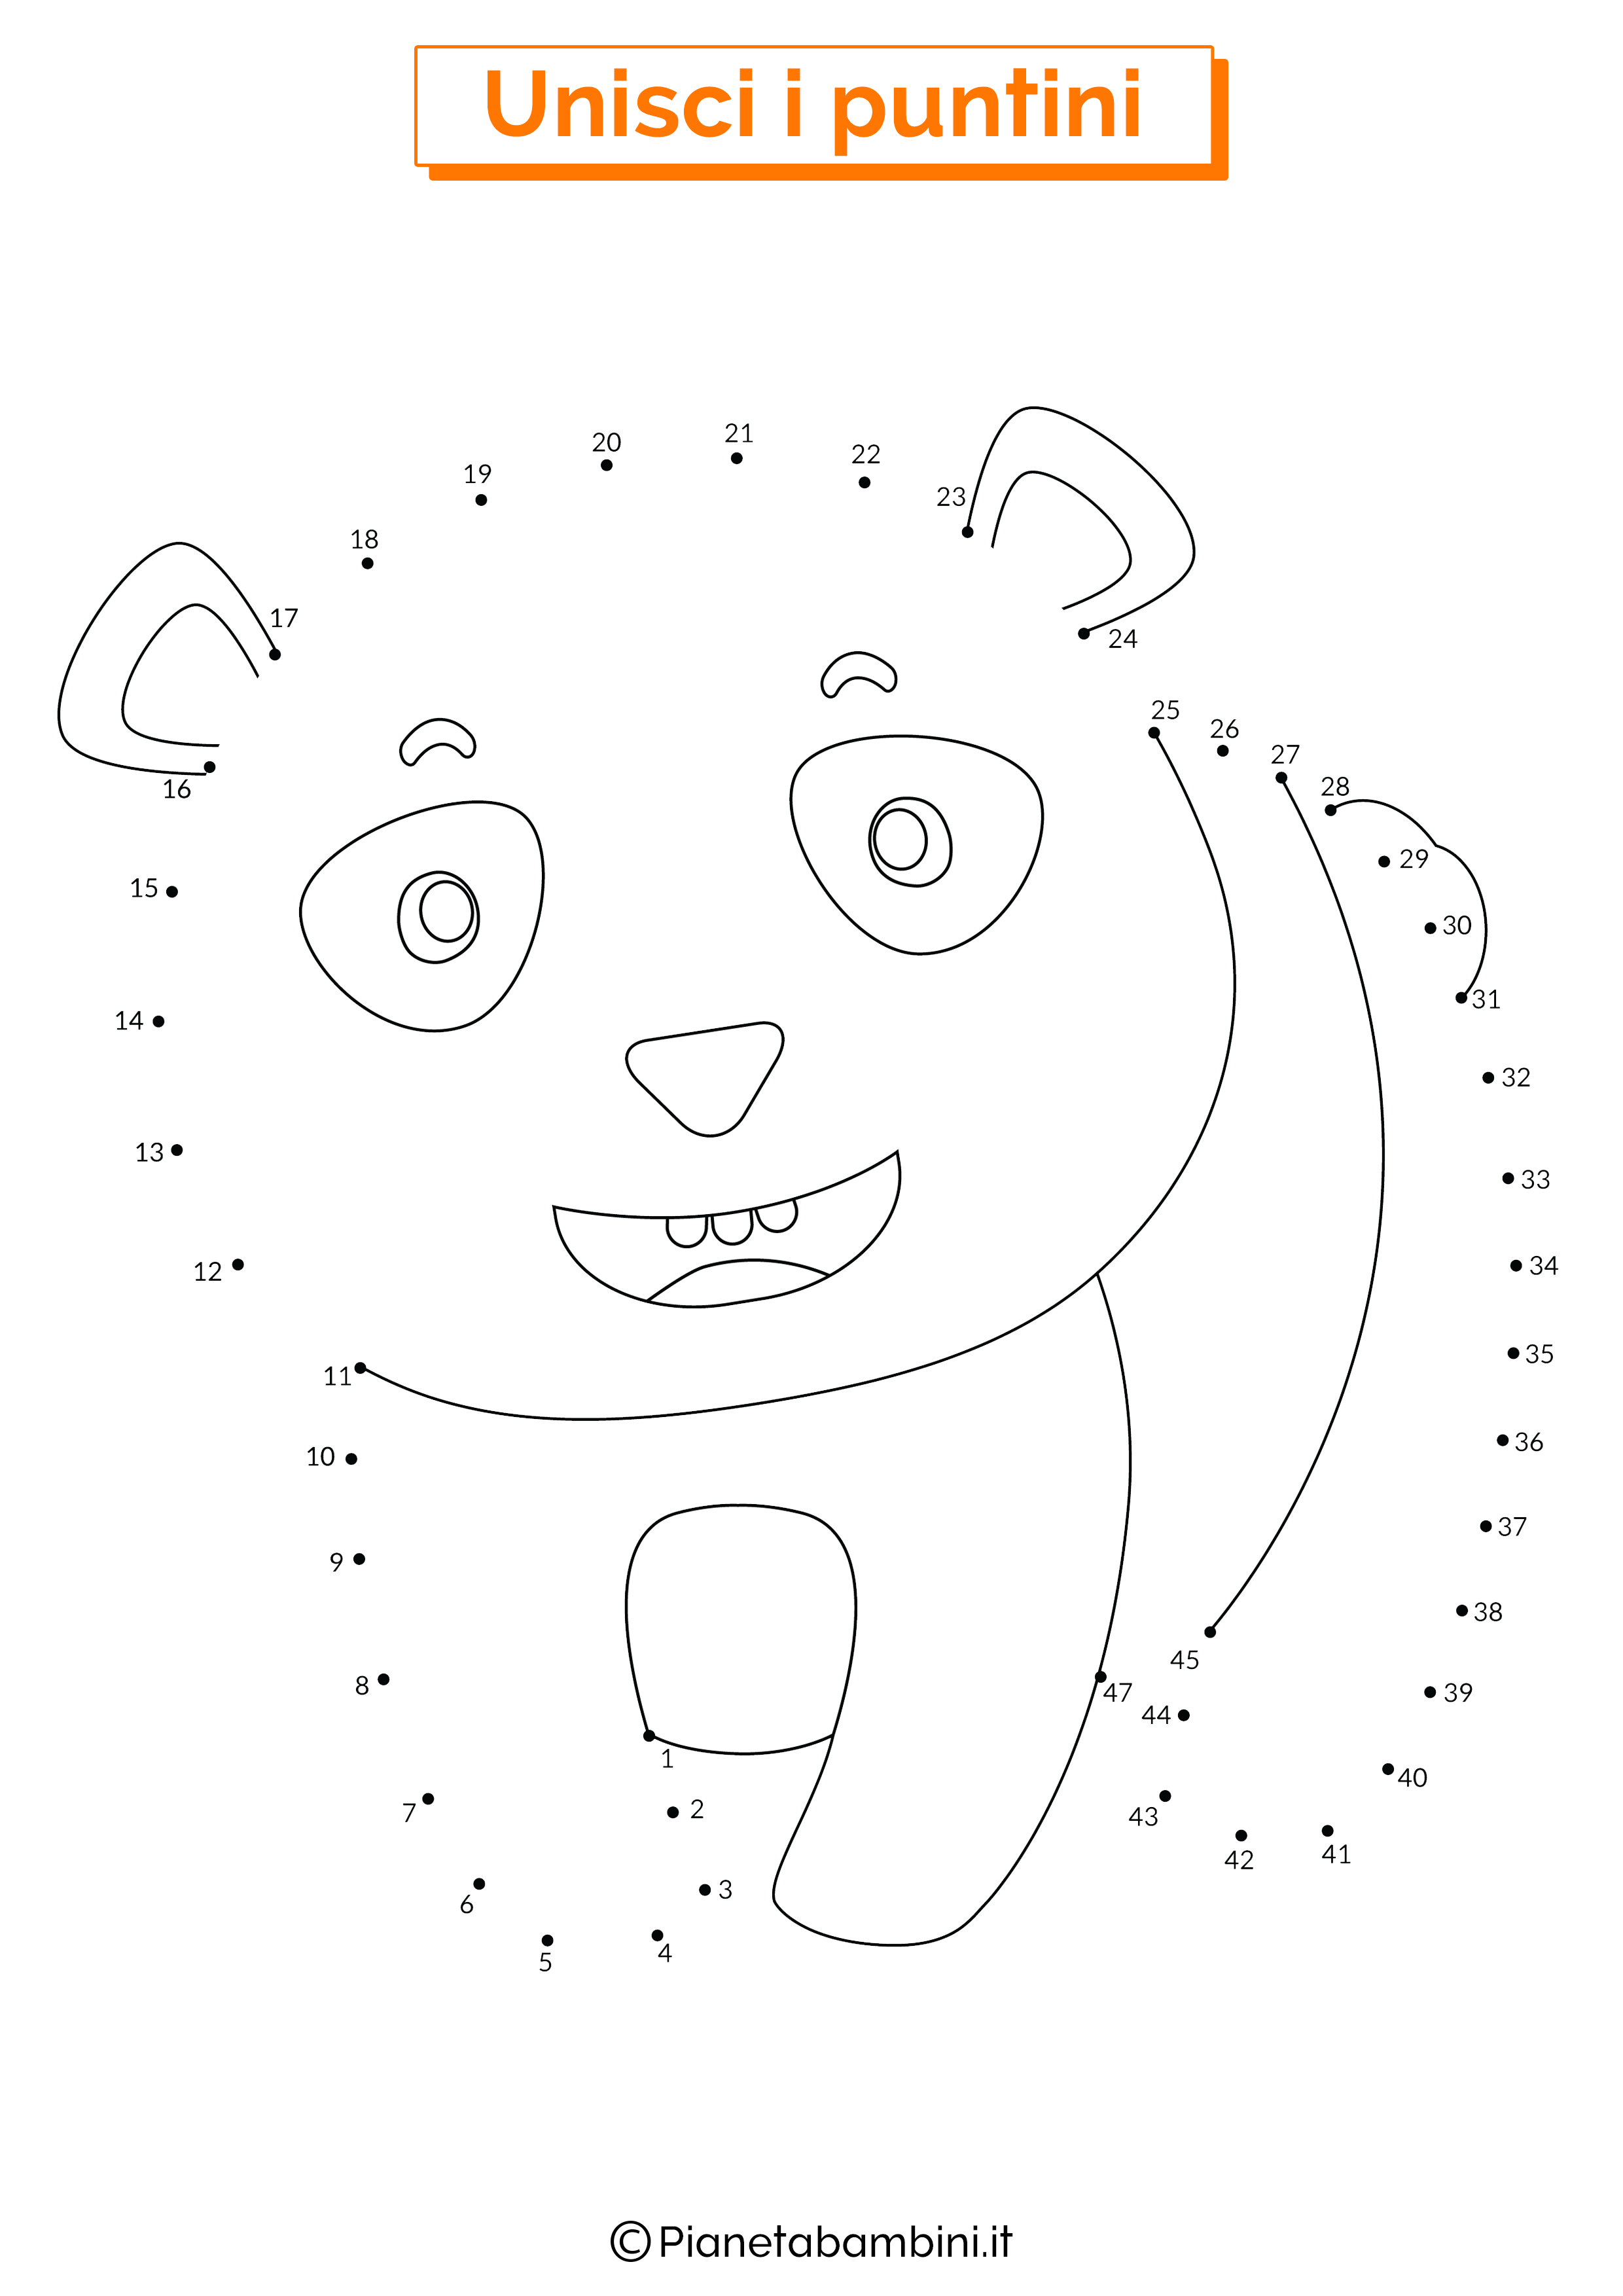 Disegno unisci i puntini da 1 a 50 panda